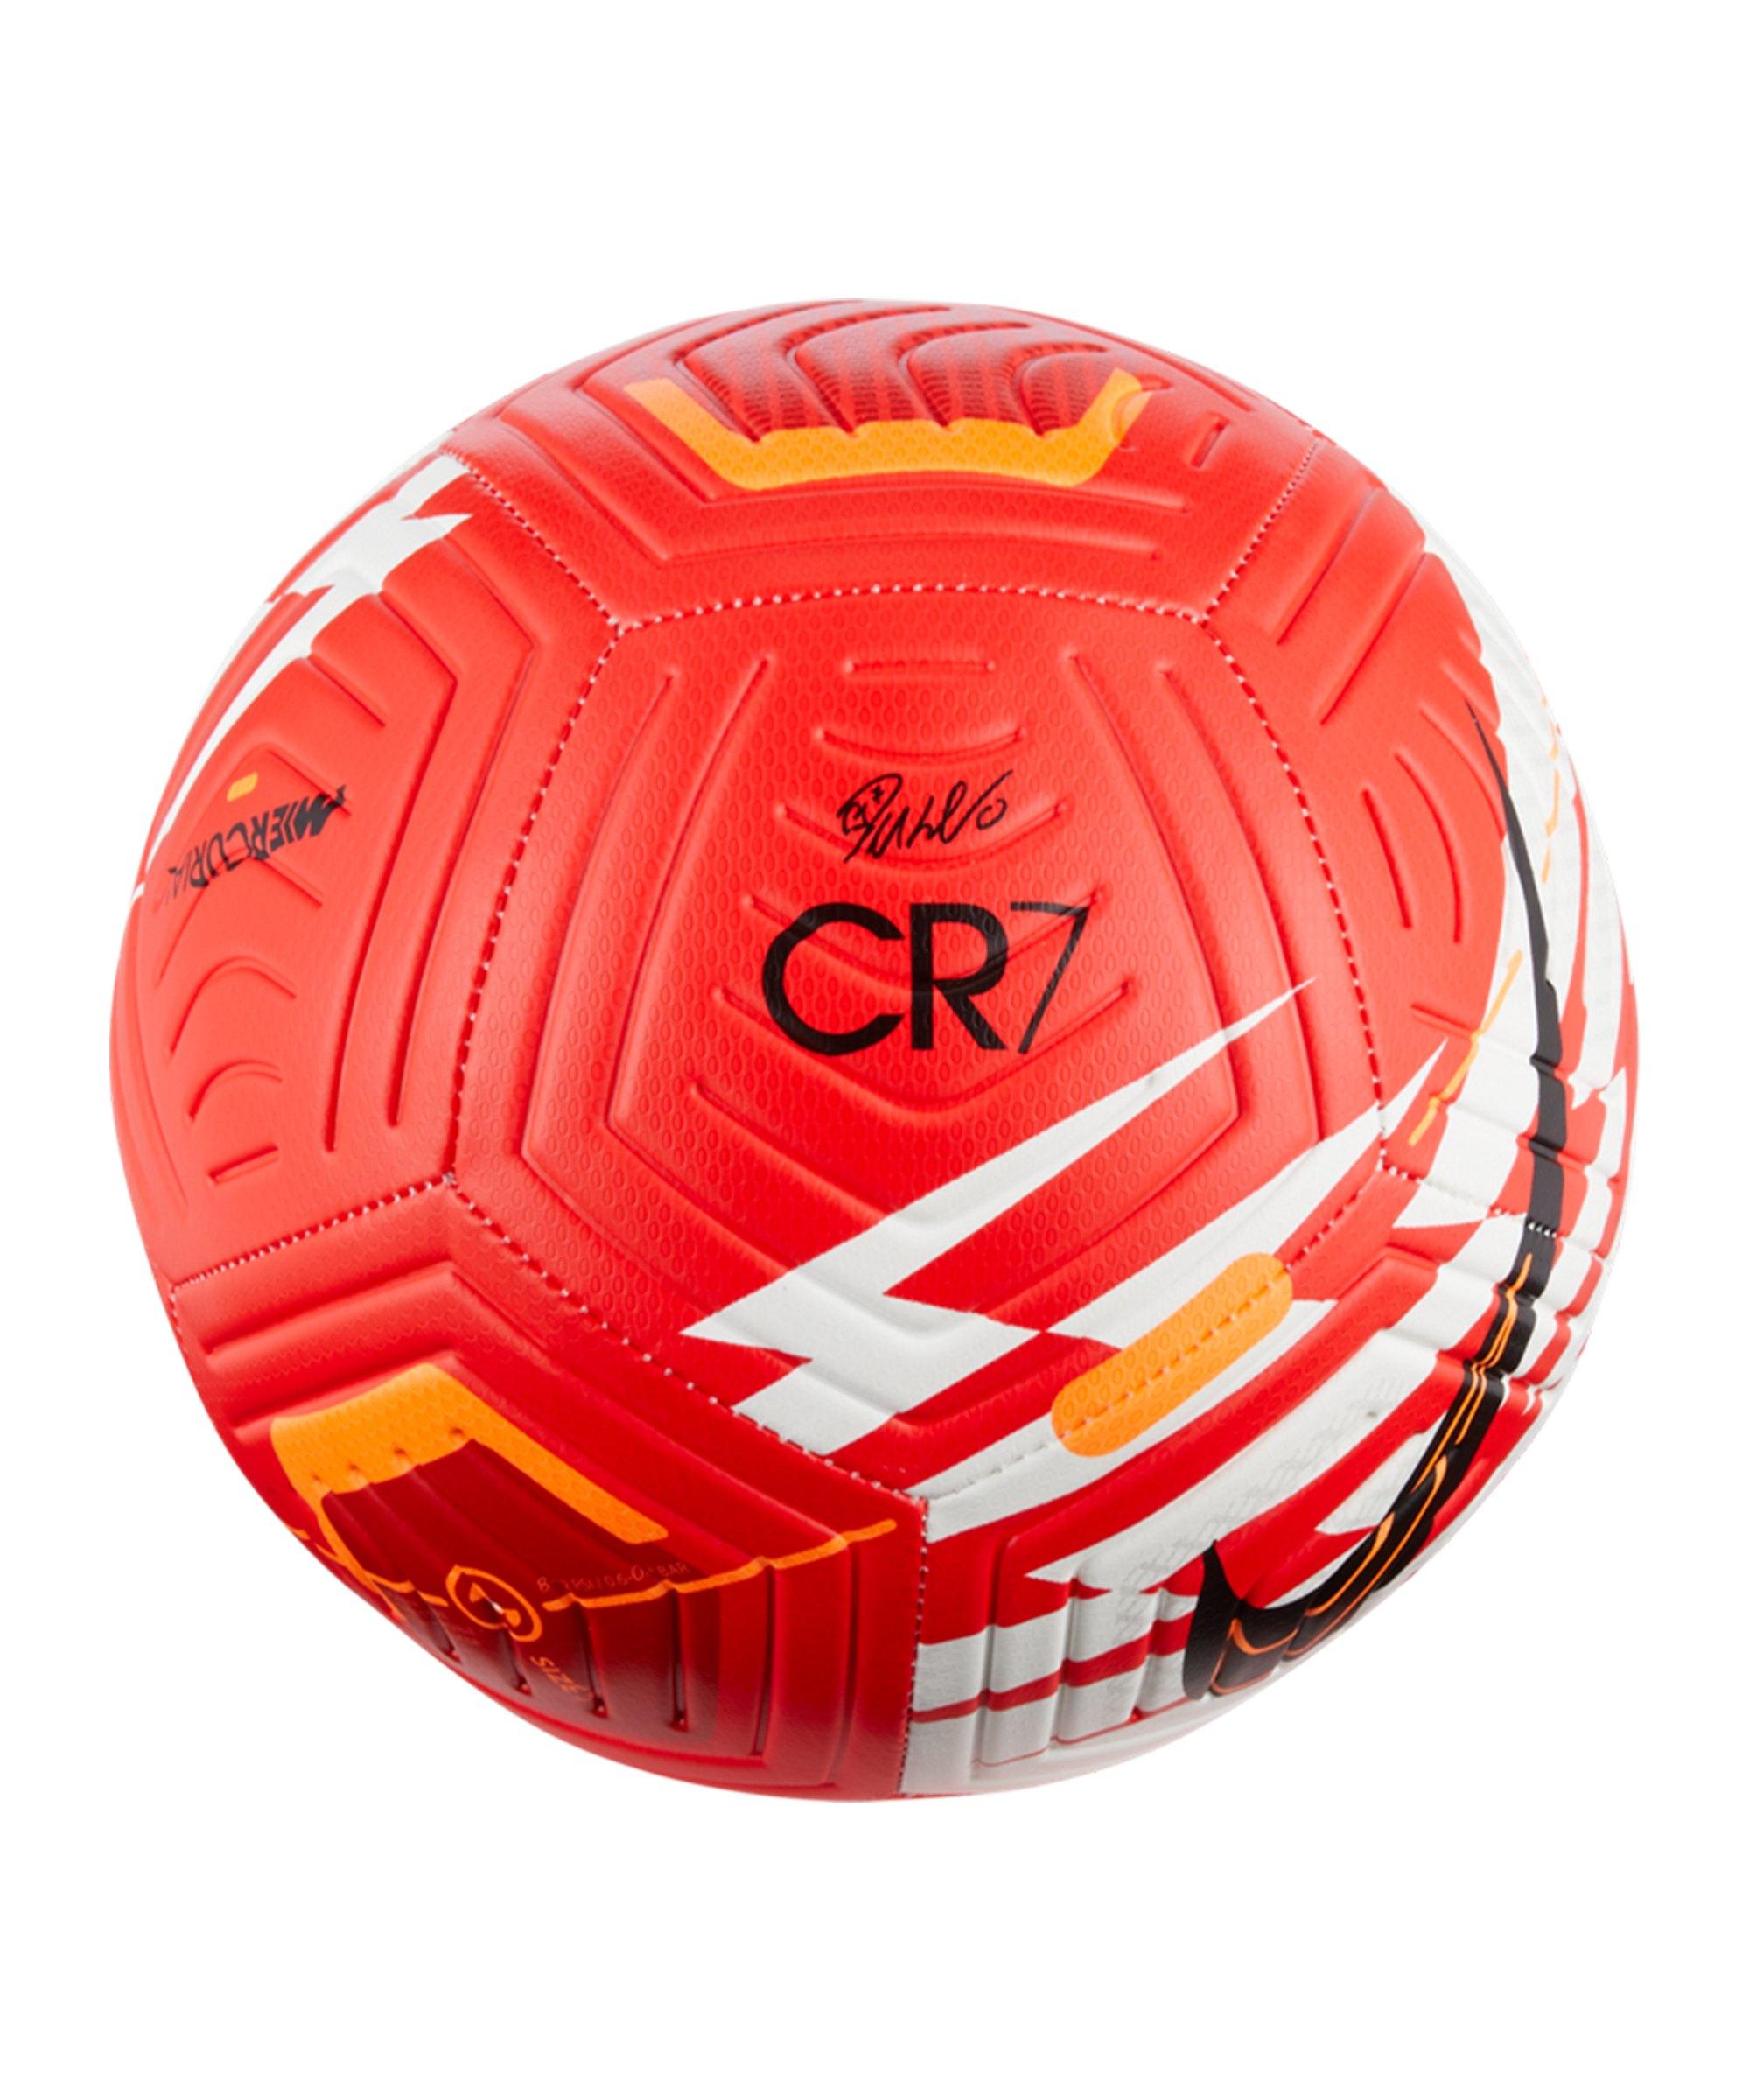 Nike Strike CR7 Fussball Rot Orange Schwarz F635 - rot